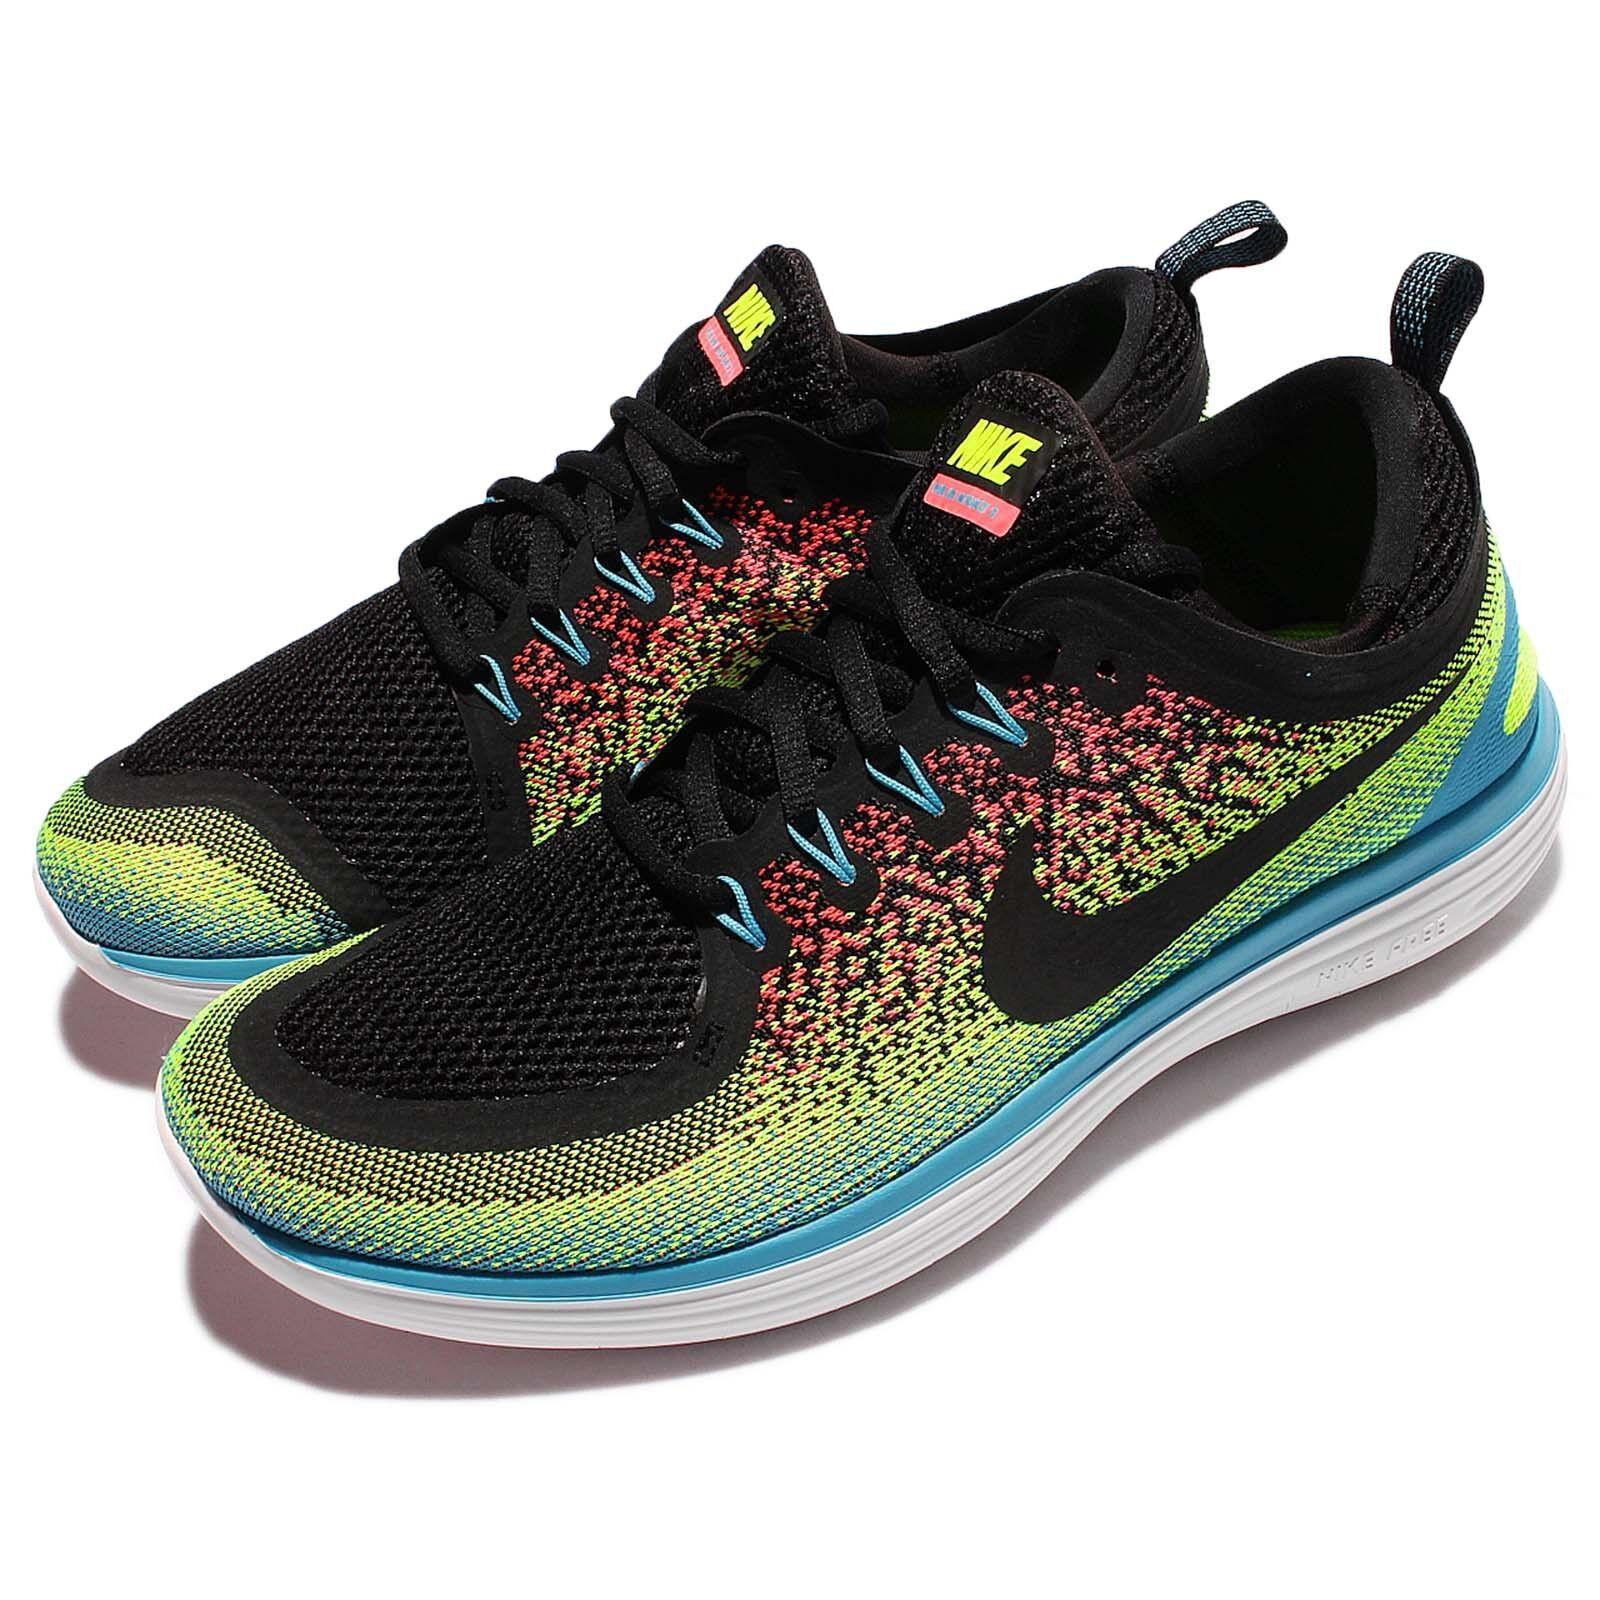 Nike Free RN RN Free Distance 2 II Run Multi-Color Men Running Shoes Sneakers 863775-701 e09b59